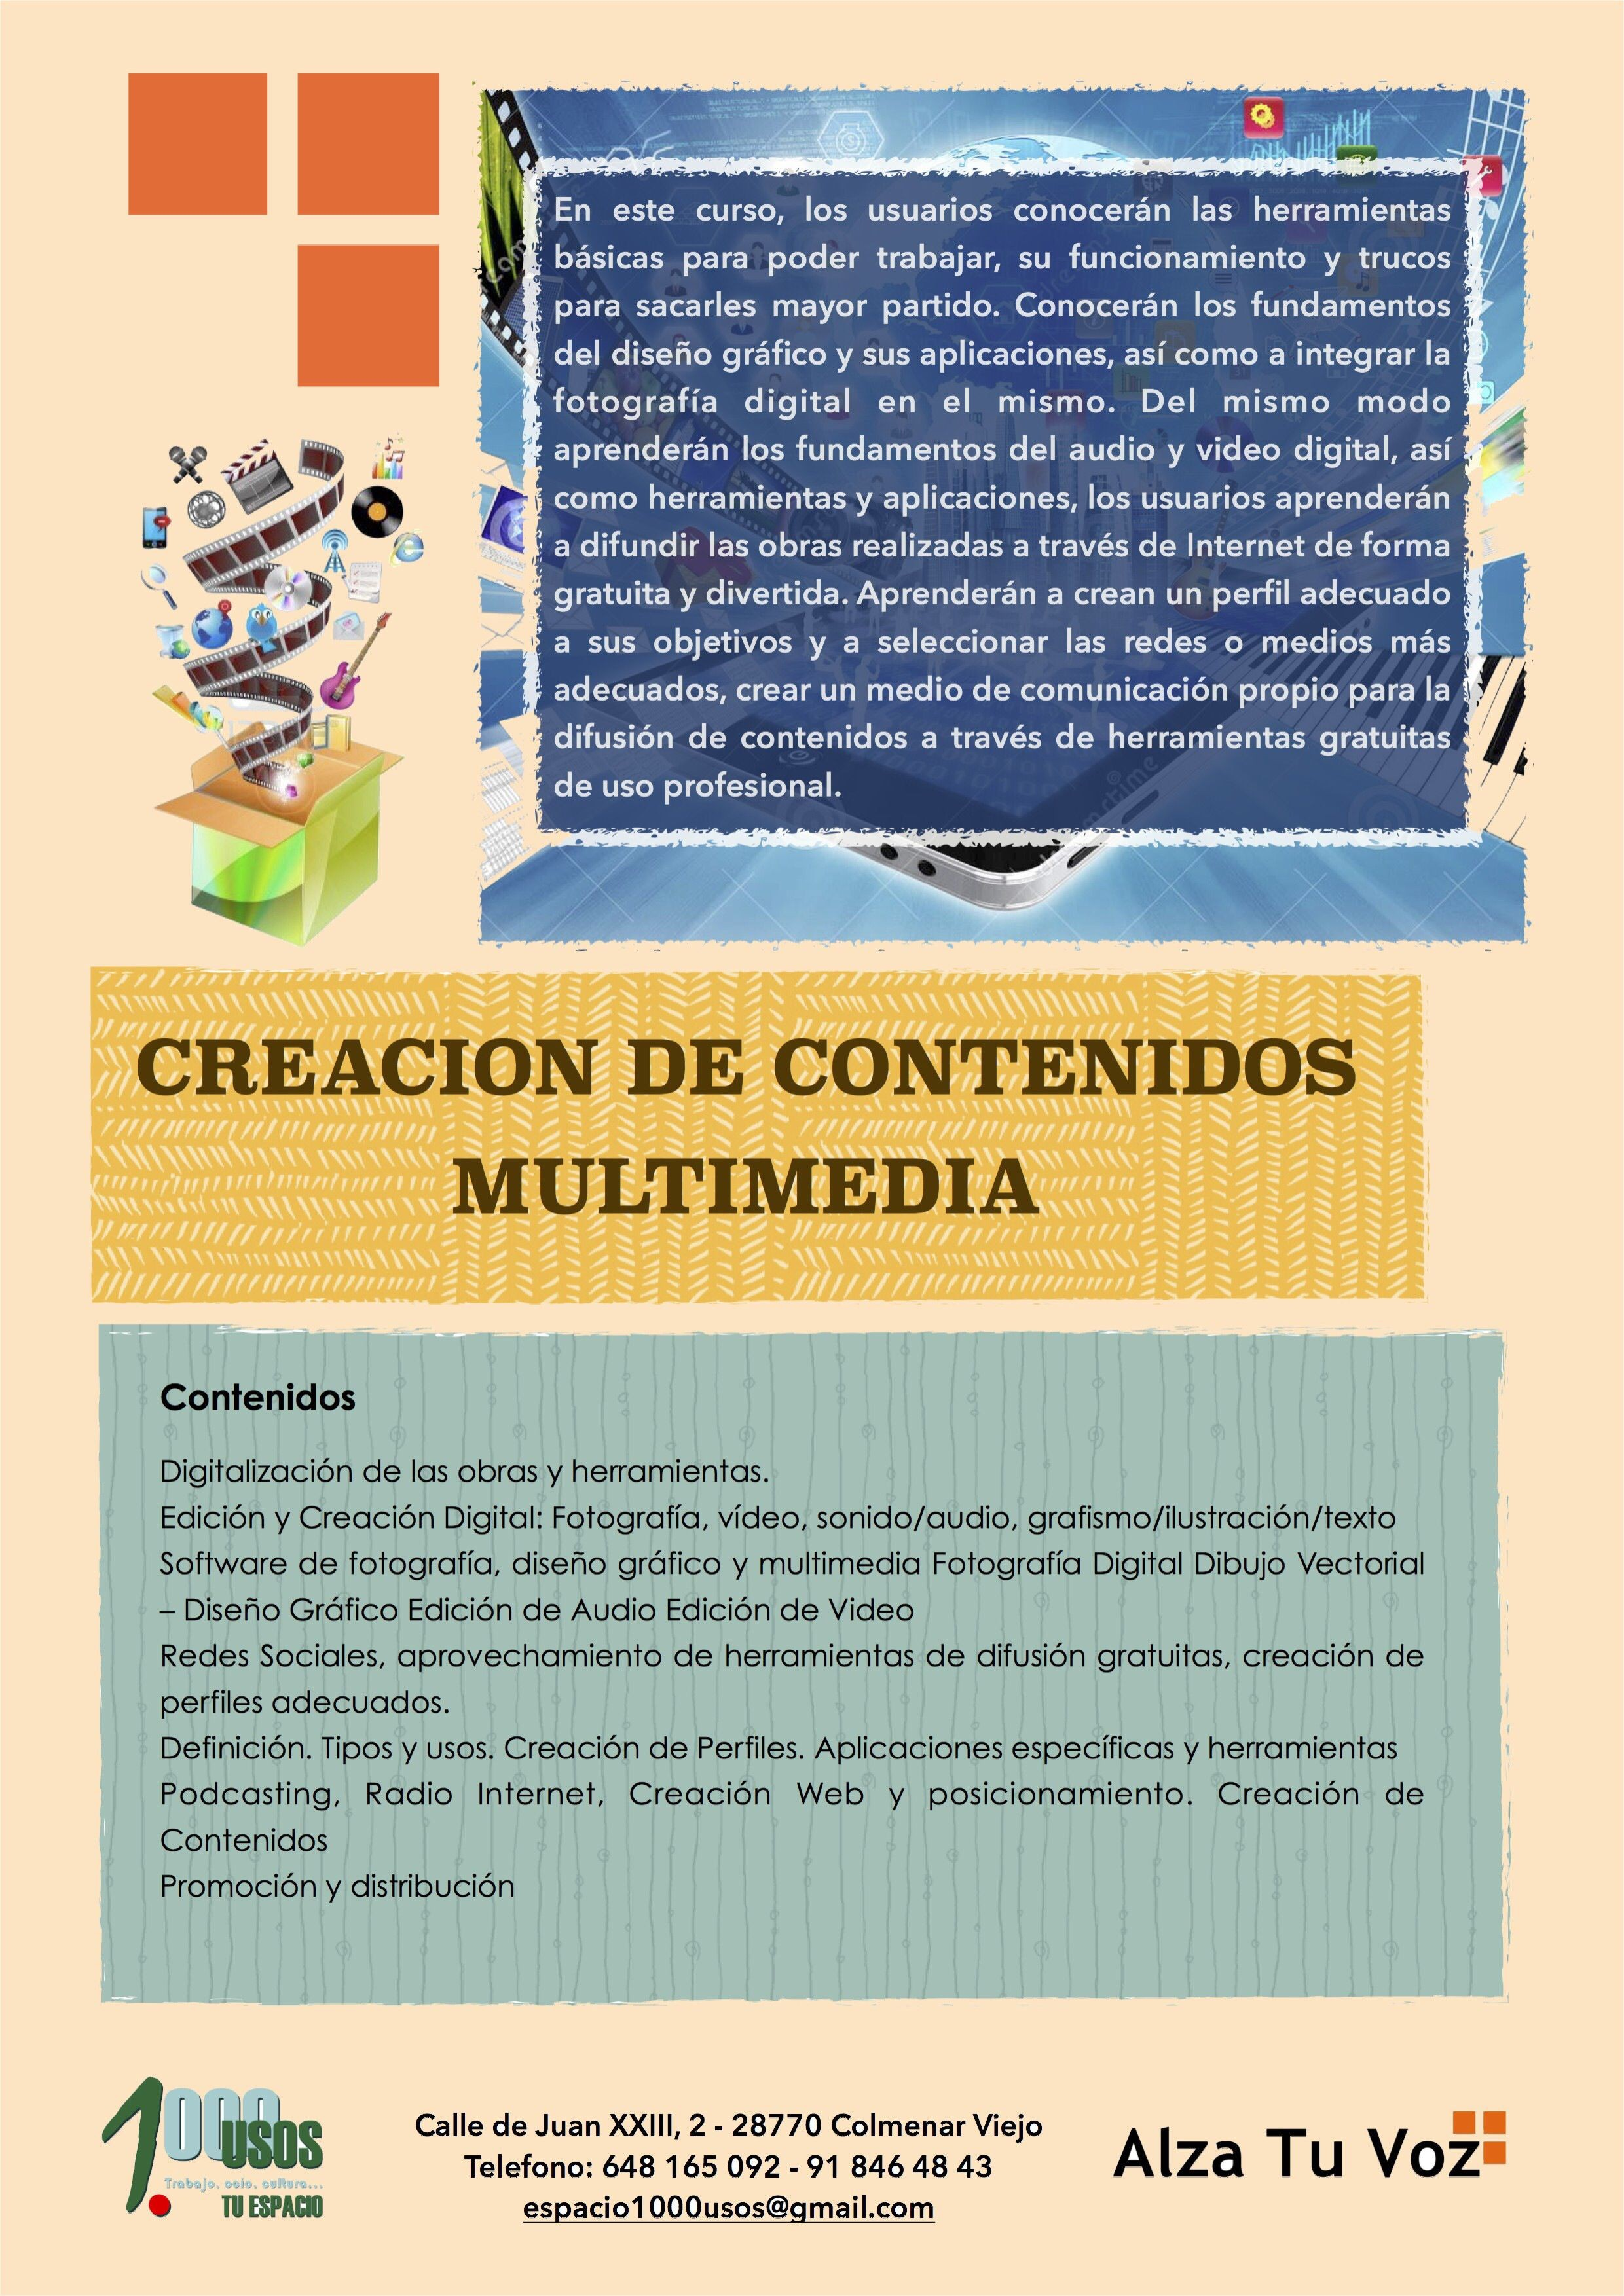 Calendario Escolar 2017 Bolivia Para Imprimir Más Actual Actividades Especficas Gratuitas Dogmagazine